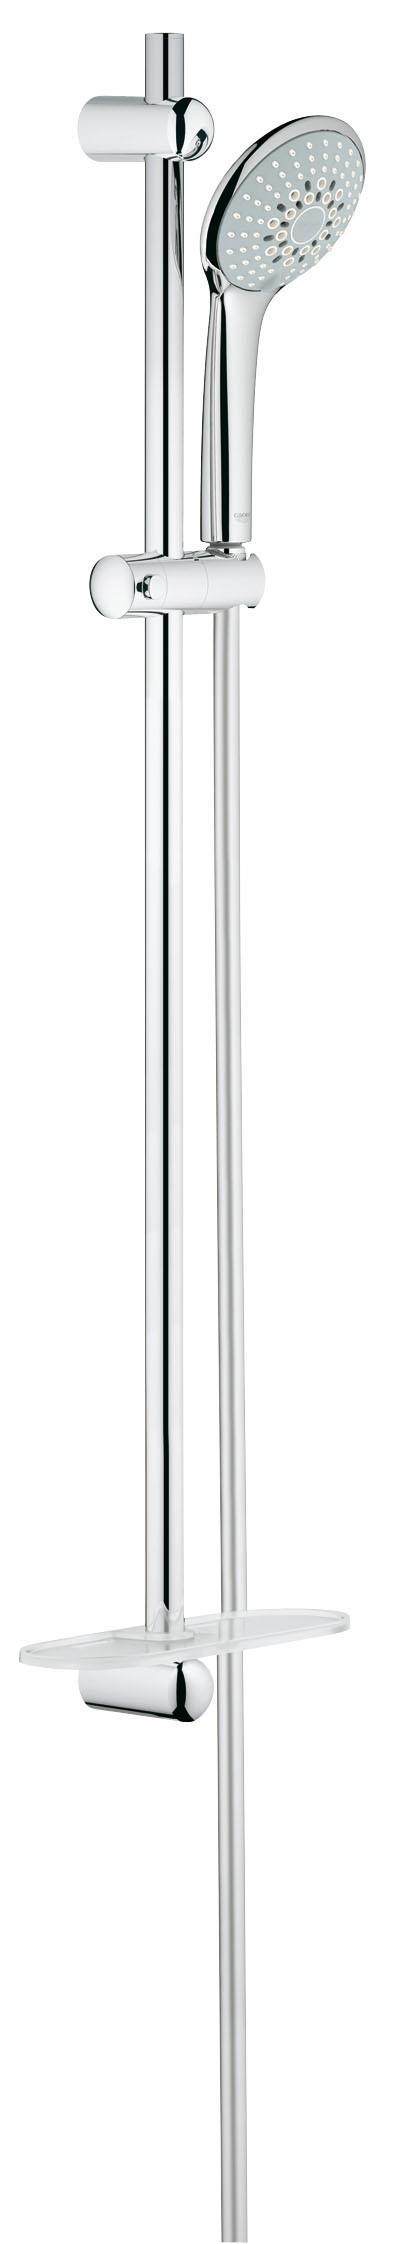 Душевой гарнитур Grohe 27227001 Euphoria (ручной душ, штанга 900 мм, шланг 1750 мм), хром (27227001)